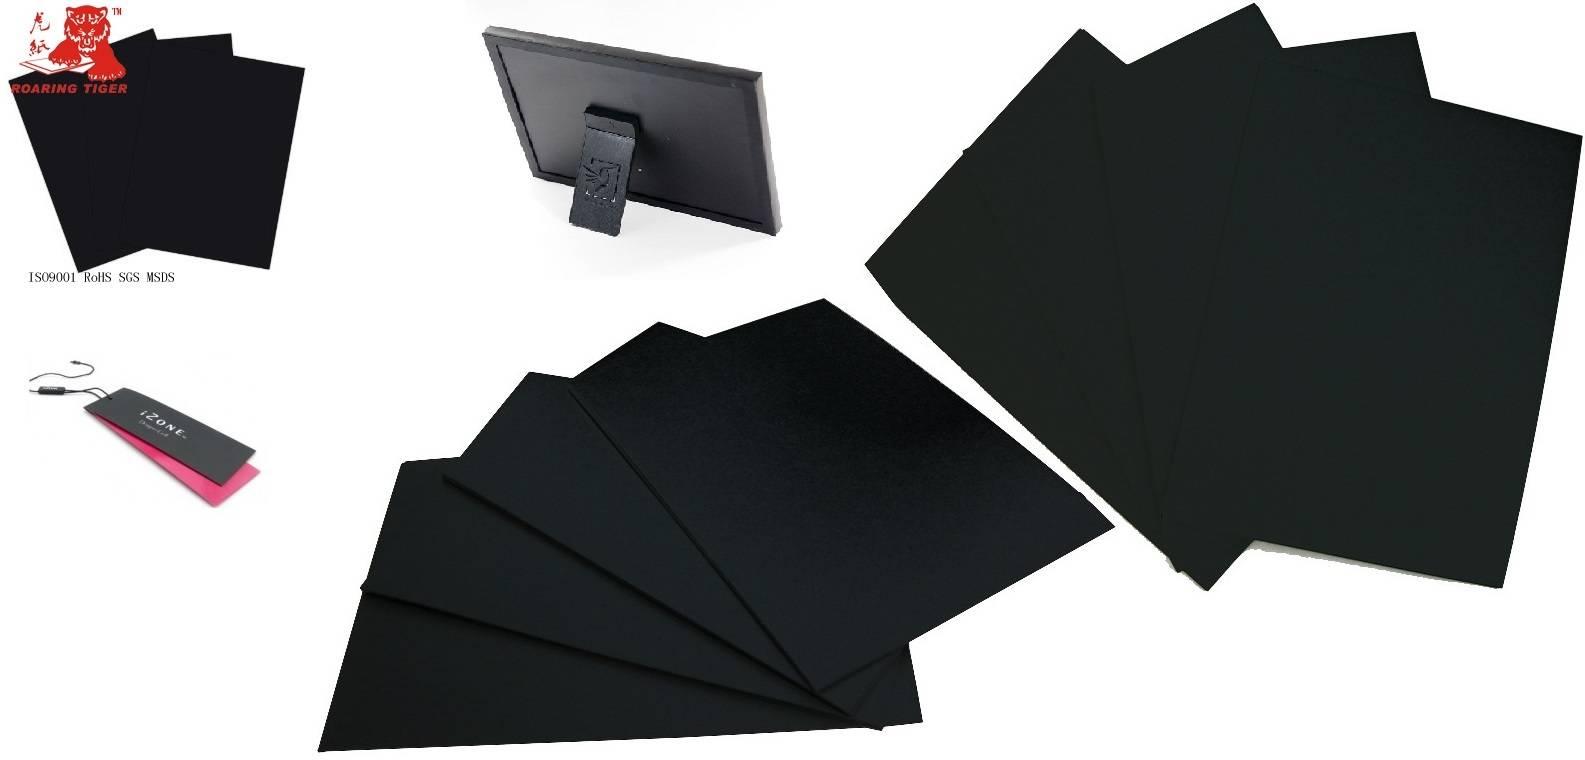 China stiff black paper/board/laminated cardboard 500gsm 550gsm 600gsm 650gsm 700gsm 750gsm 800gsm 8